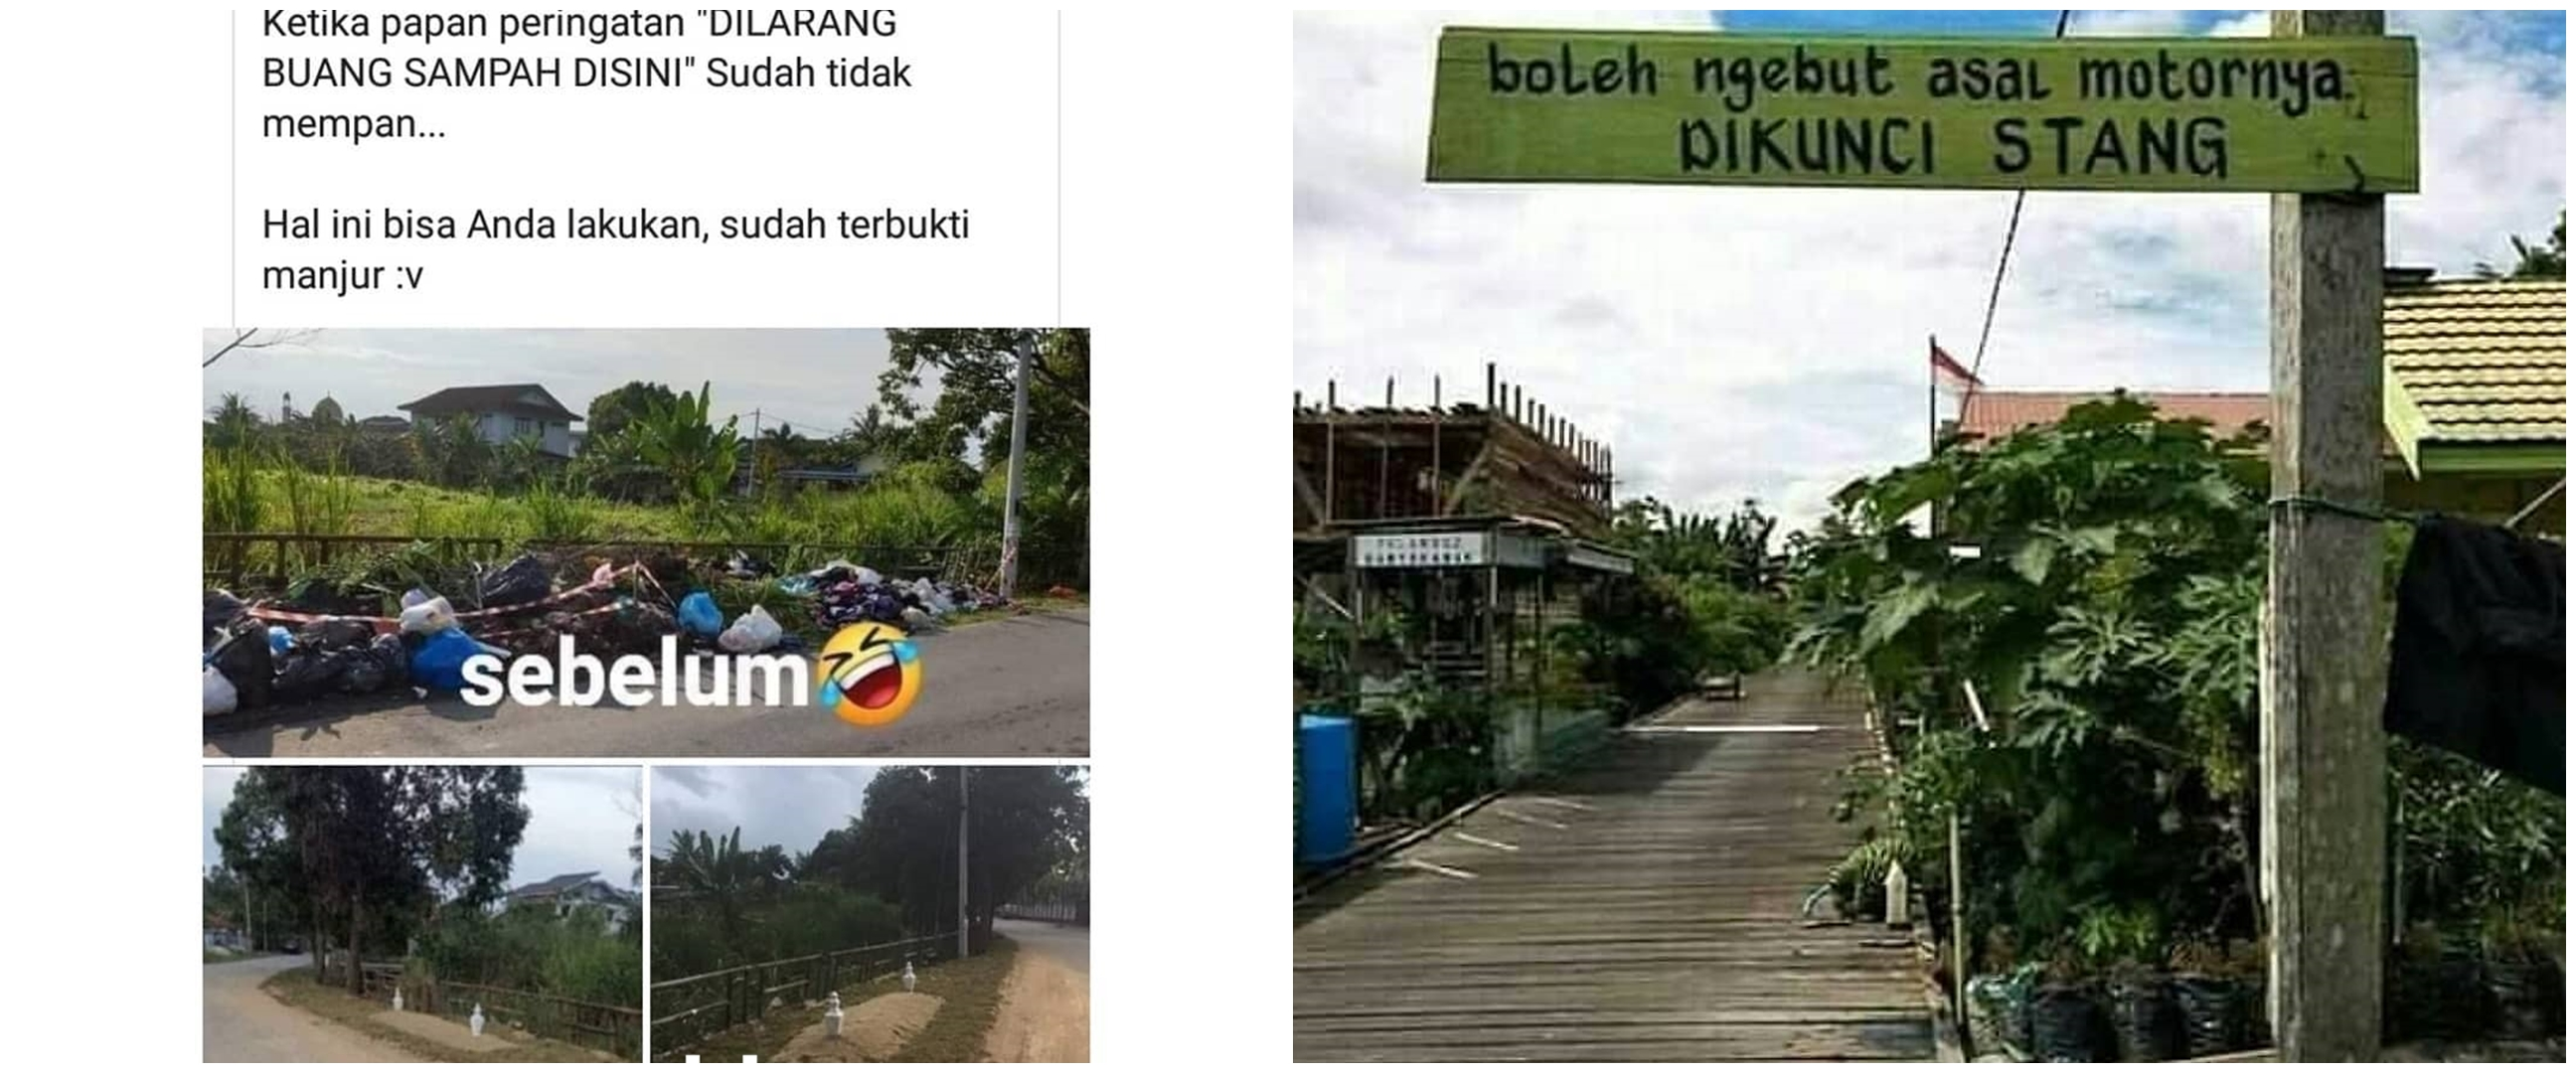 10 Potret lucu jenis peringatan di Indonesia, kocak